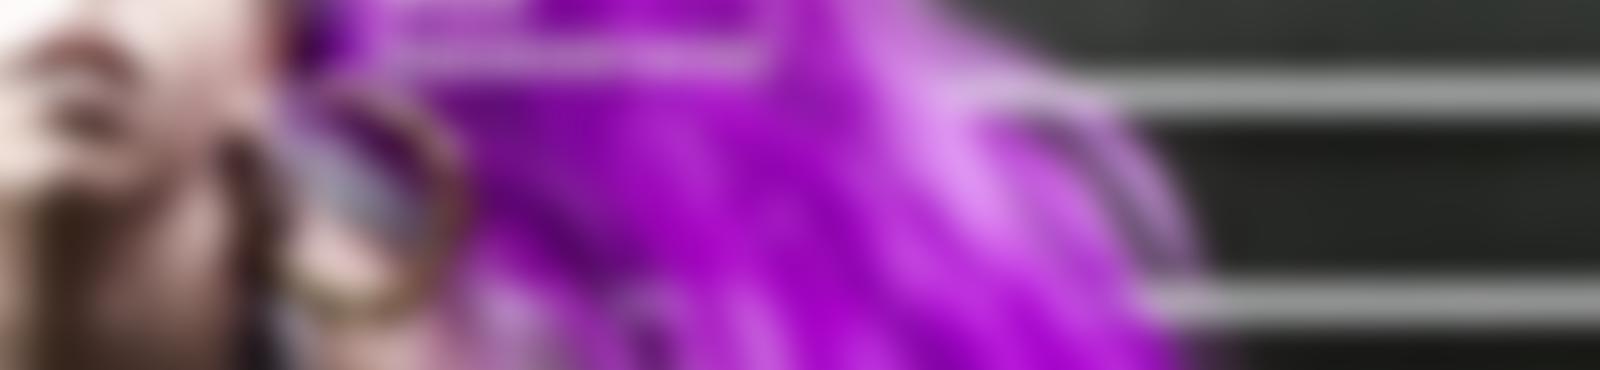 Blurred 8e21262f 8162 4c59 a0b0 c651b9d8b688